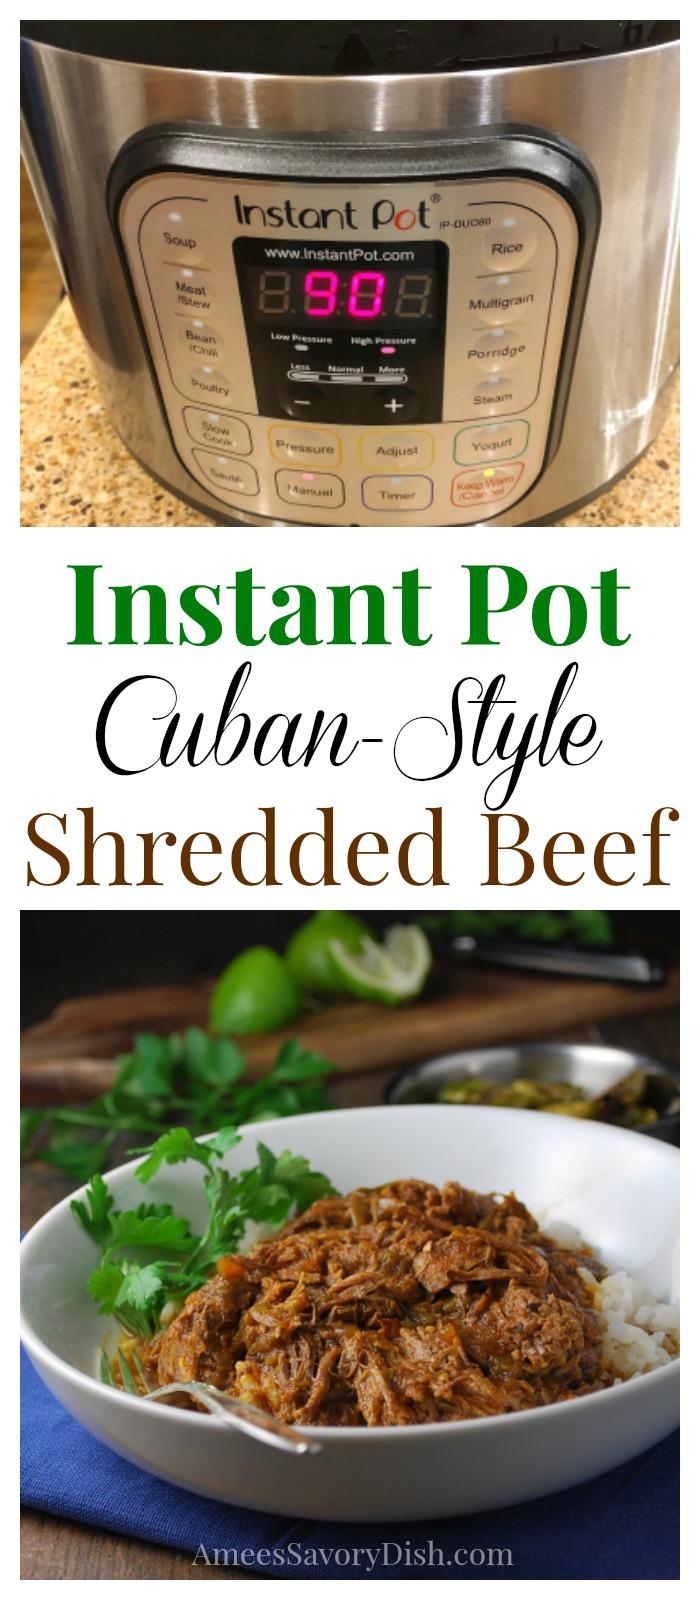 Instant Pot Cuban-Style Shredded Beef recipe